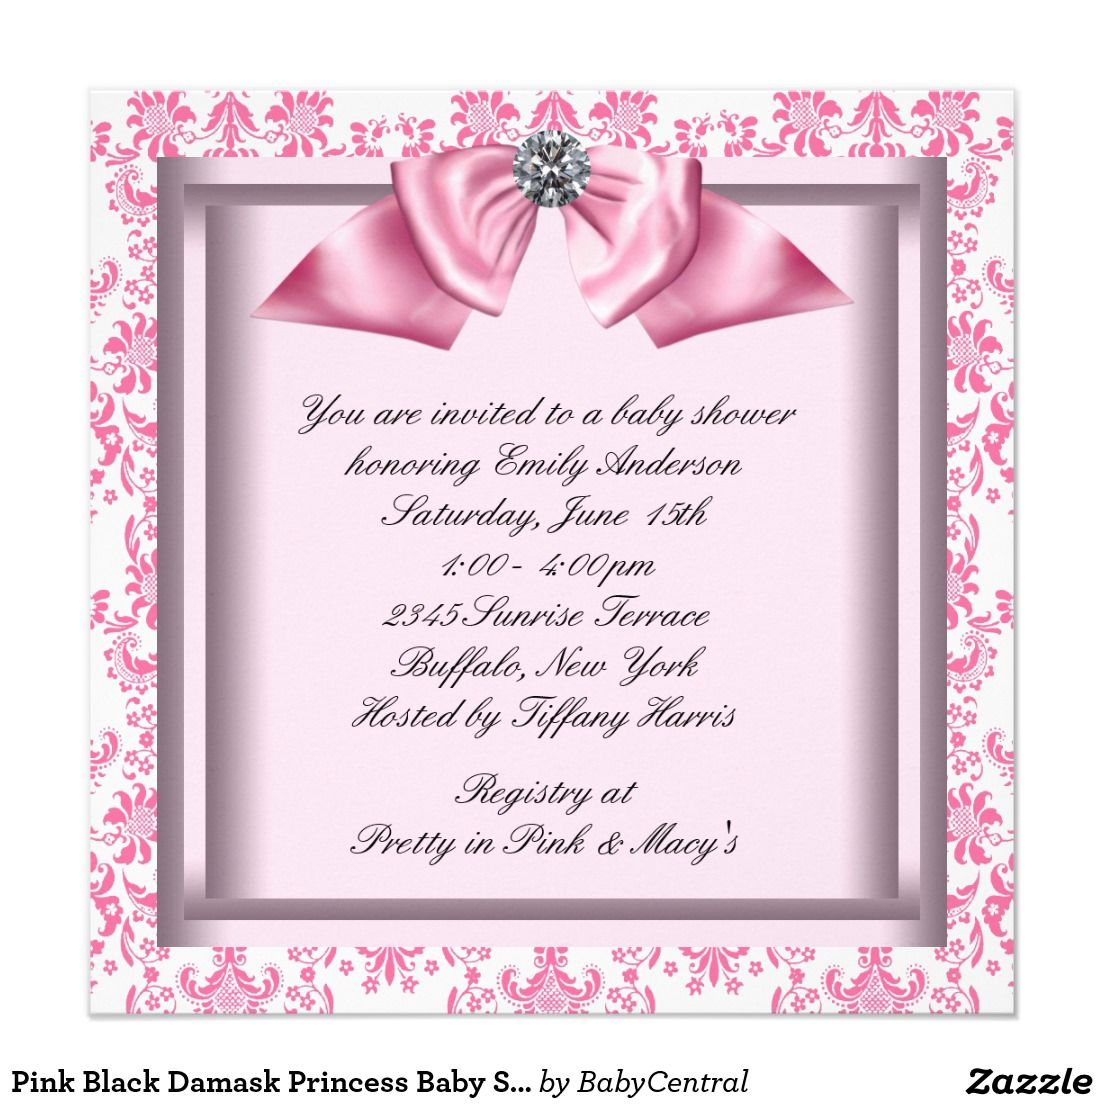 Pink Black Damask Princess Baby Shower Invitation  fa47107d79511